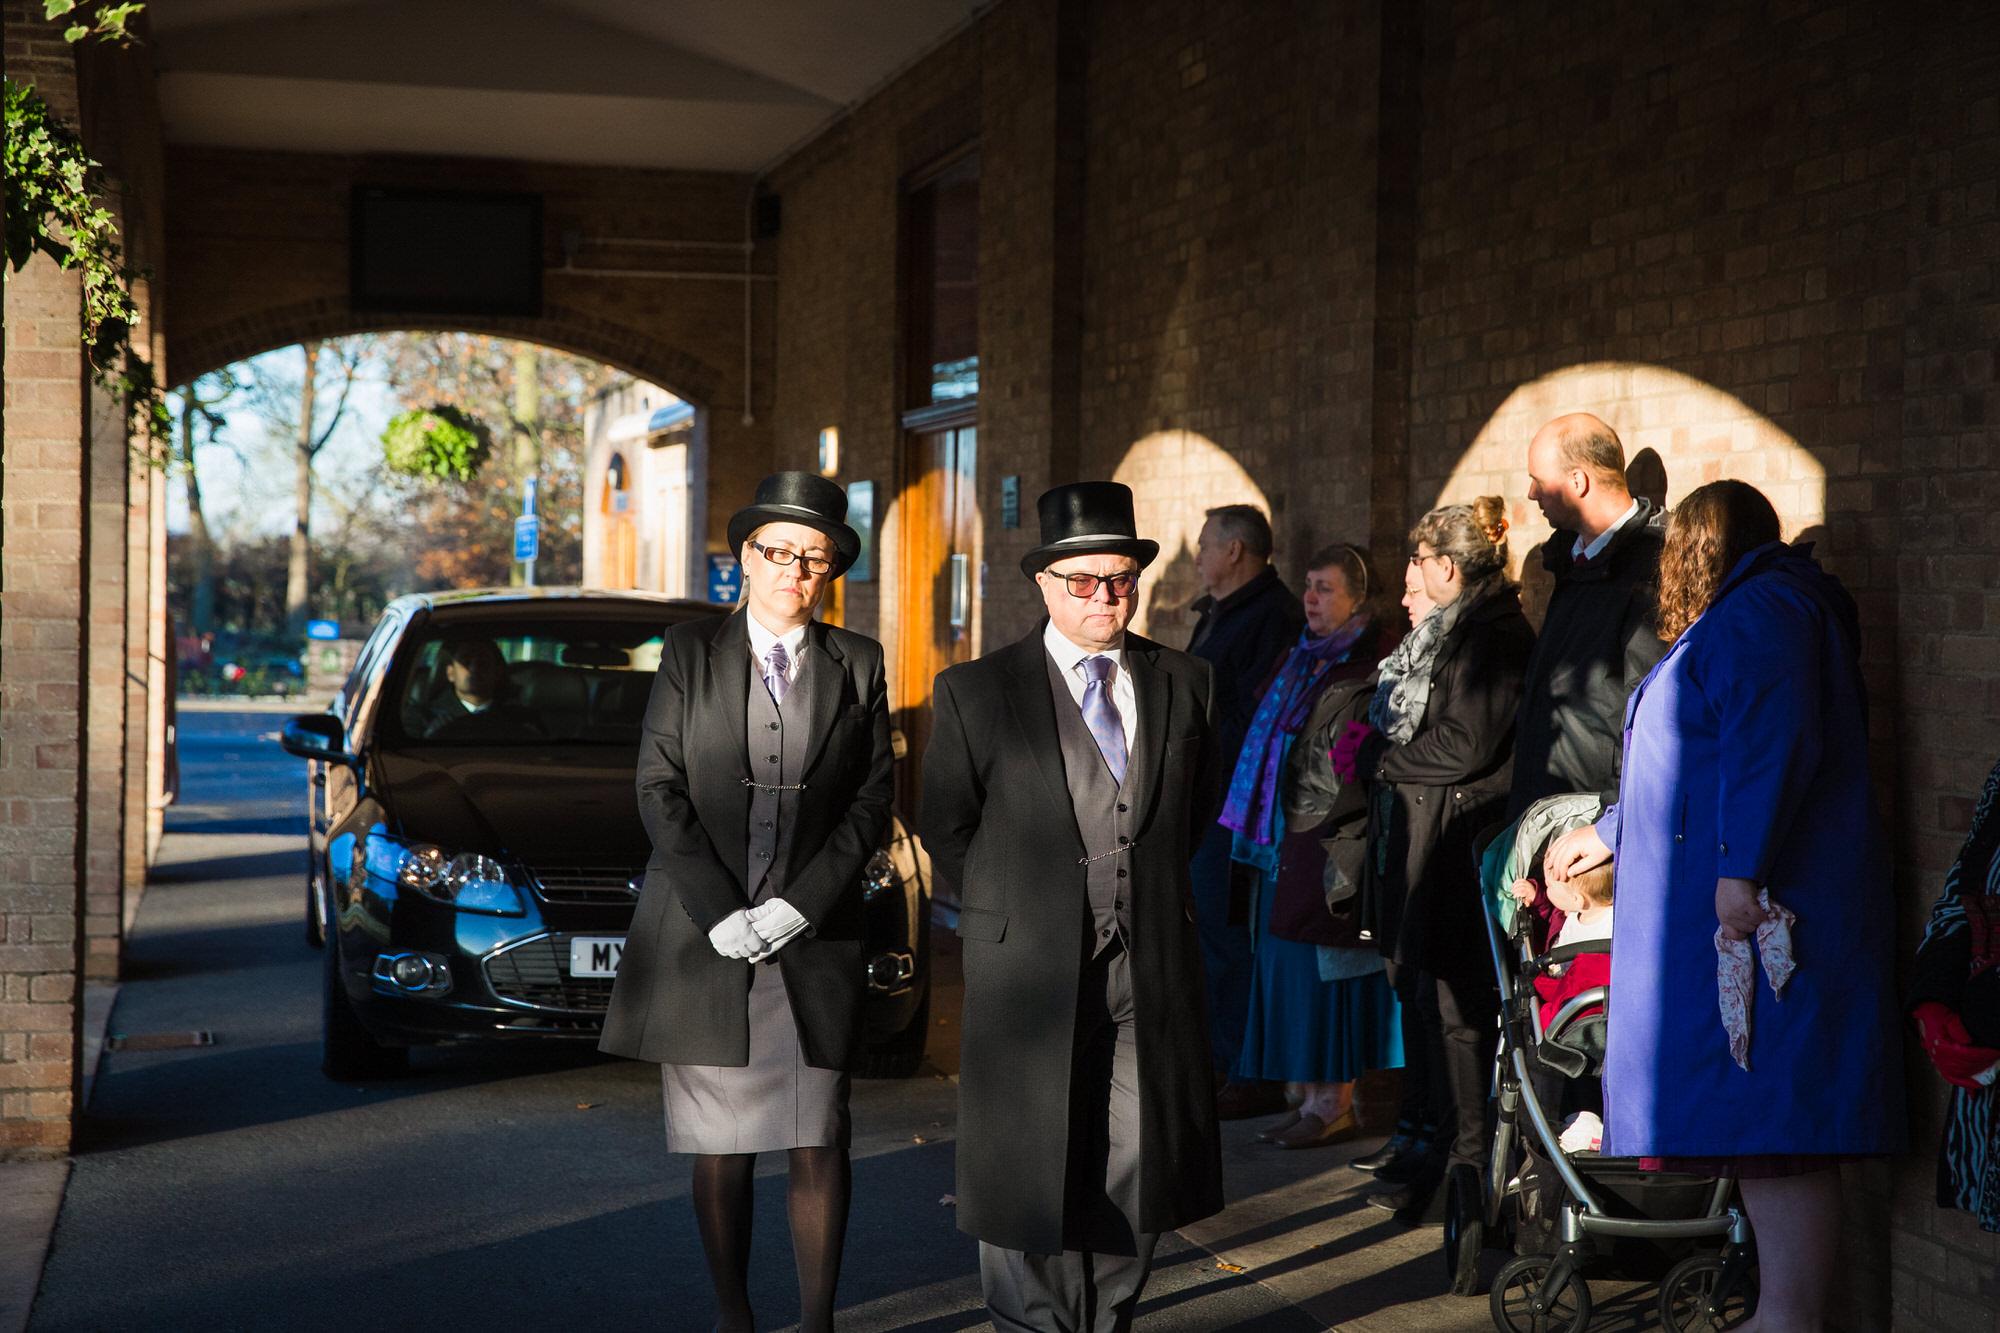 Shaun Foulds UK Funeral Photographer attending Peterborough Crematorium to photograph a Memorial Service.